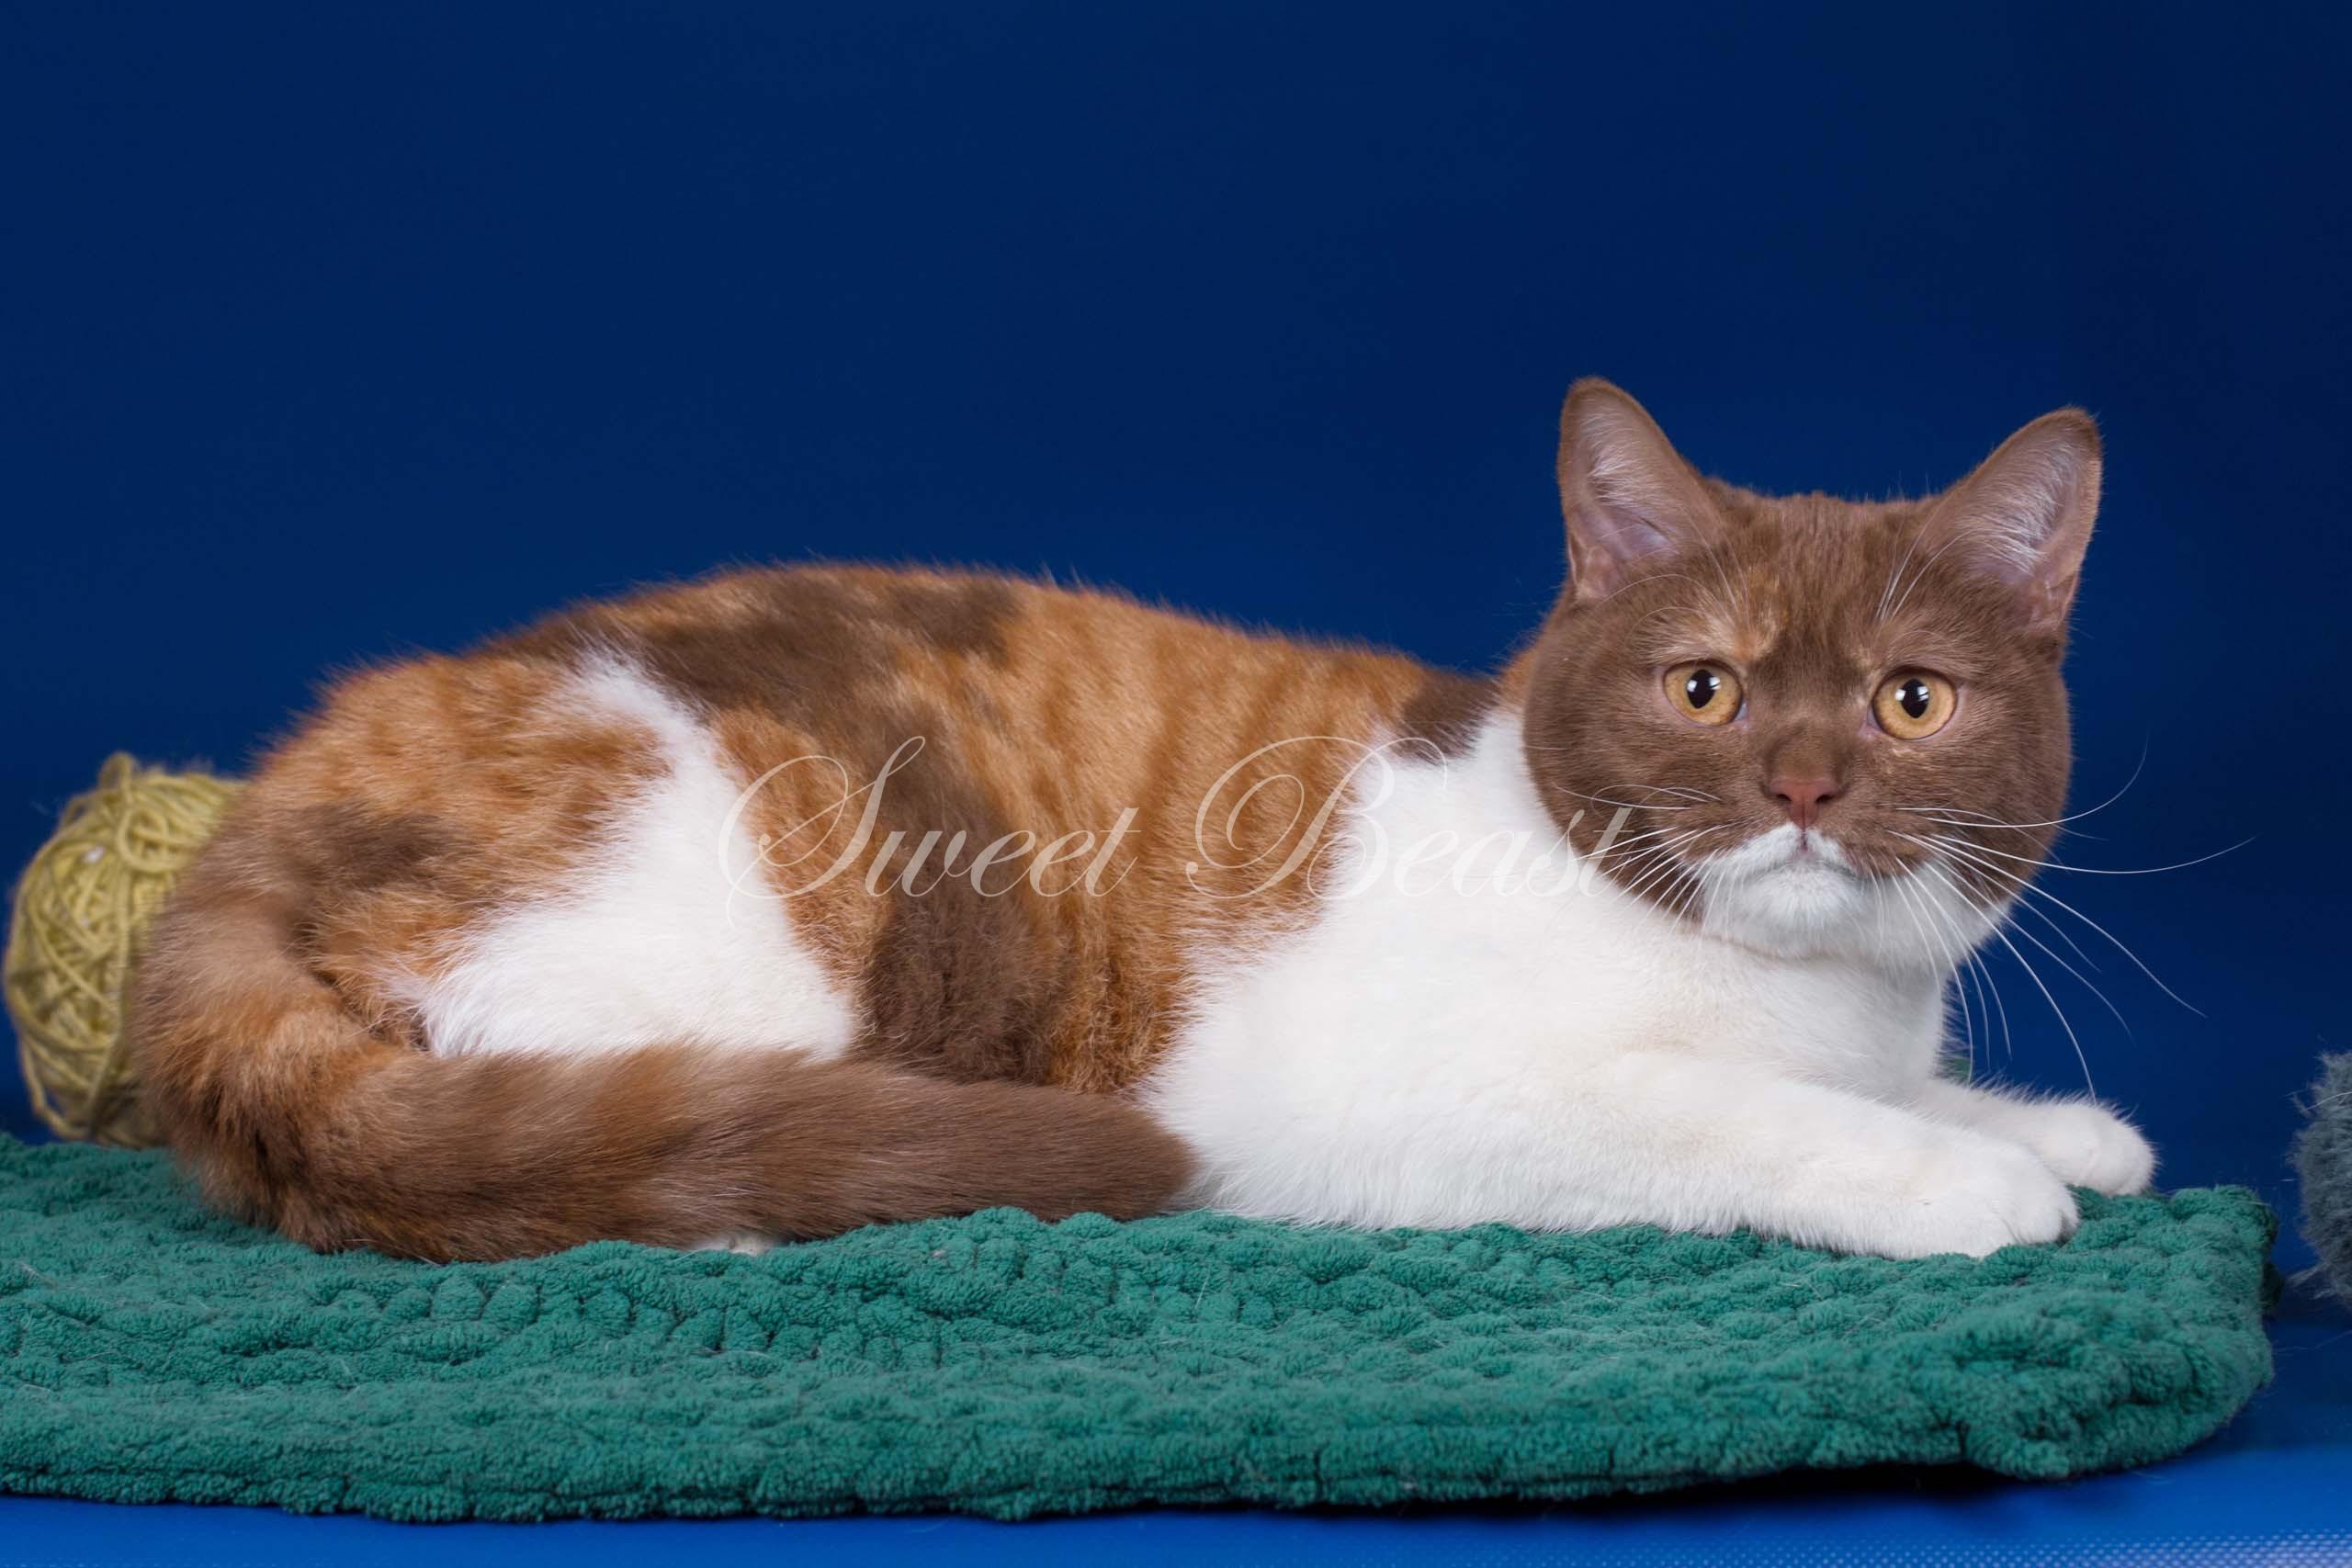 Sweet-beast com | British Shorthair | Kittens